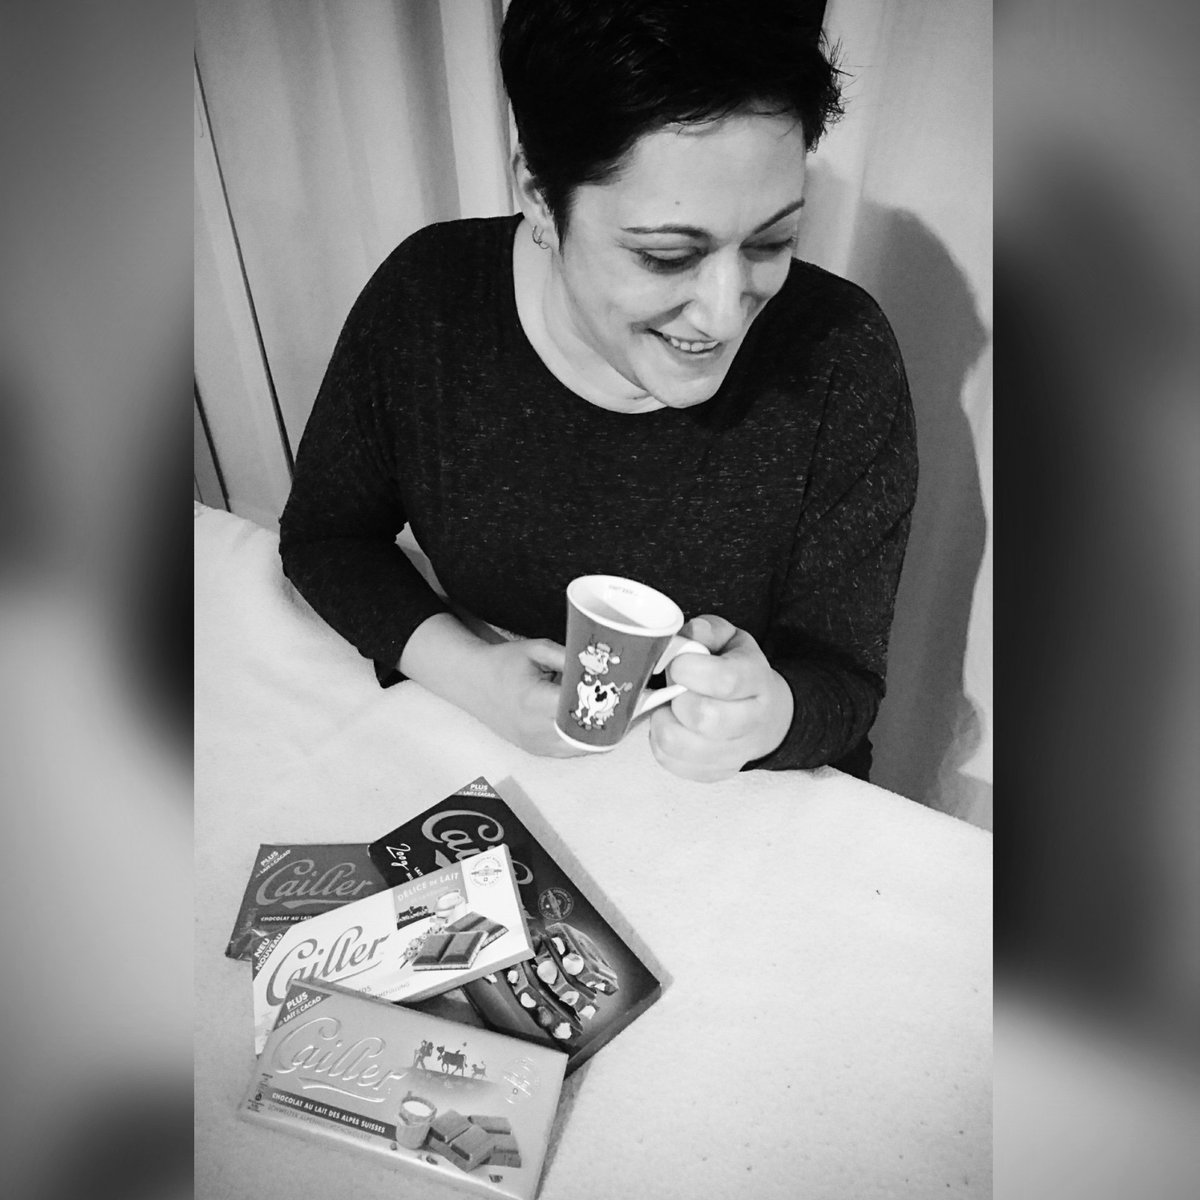 Simple pleasure from Switzerland 🍫🇨🇭....  Café: @nespresso  Chocolate: @cailler_suisse  #pleasure #Switzerland #nespresso #cailler #chocolate #havinggoodtimes #stolenpic #PrivateJoke